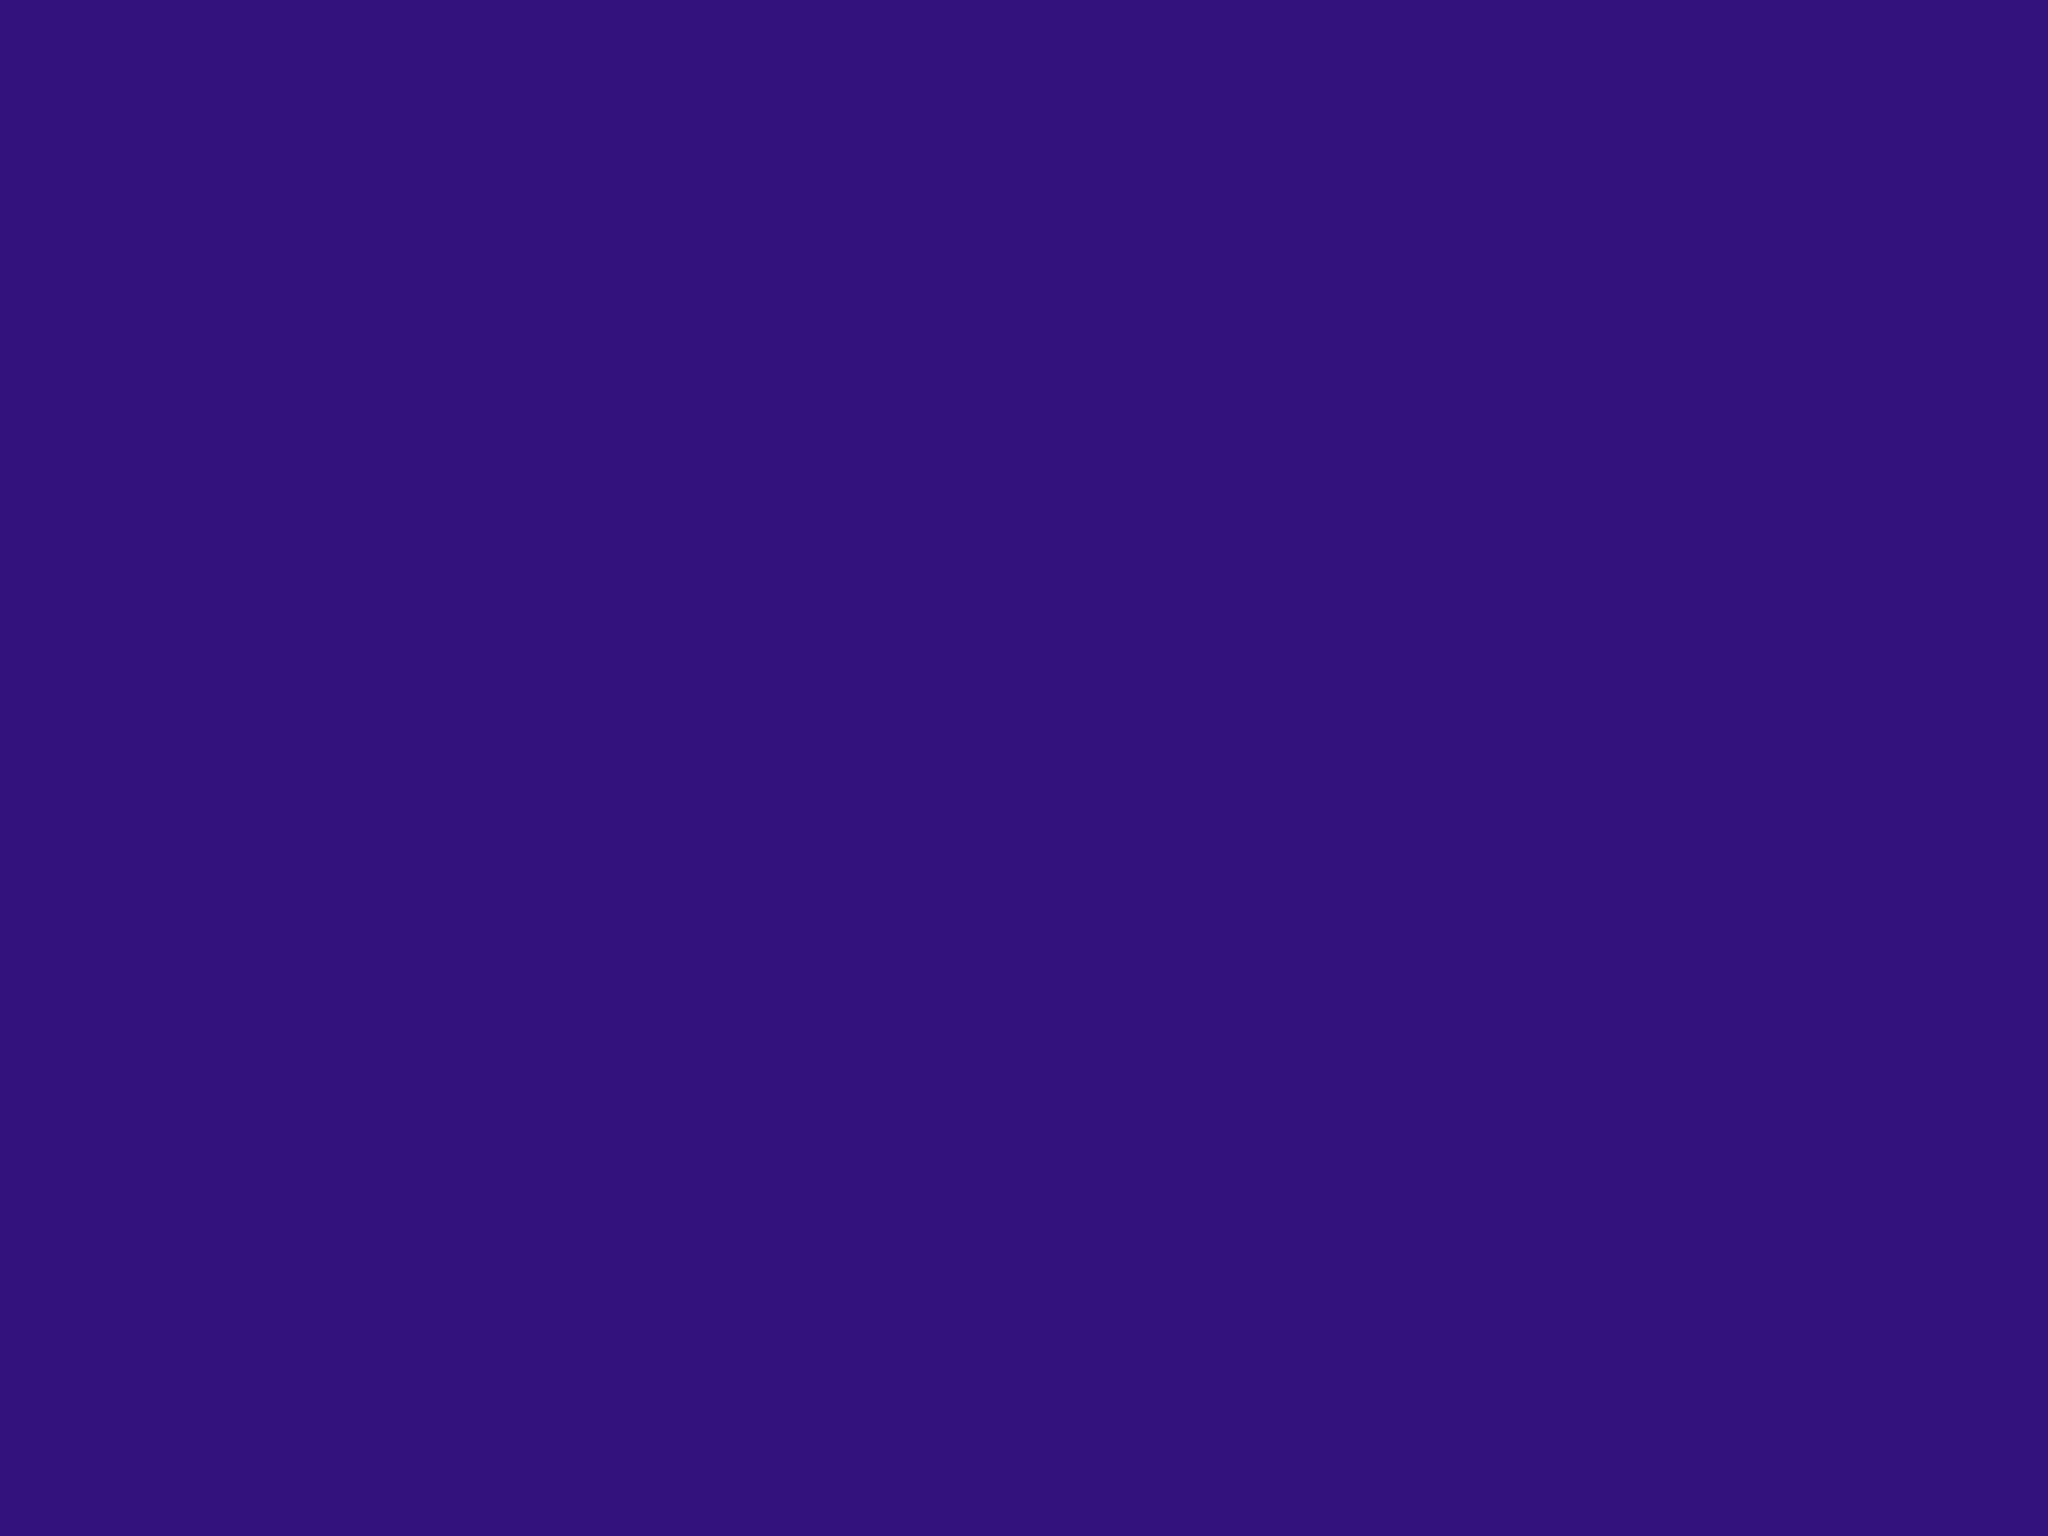 2048x1536 Persian Indigo Solid Color Background